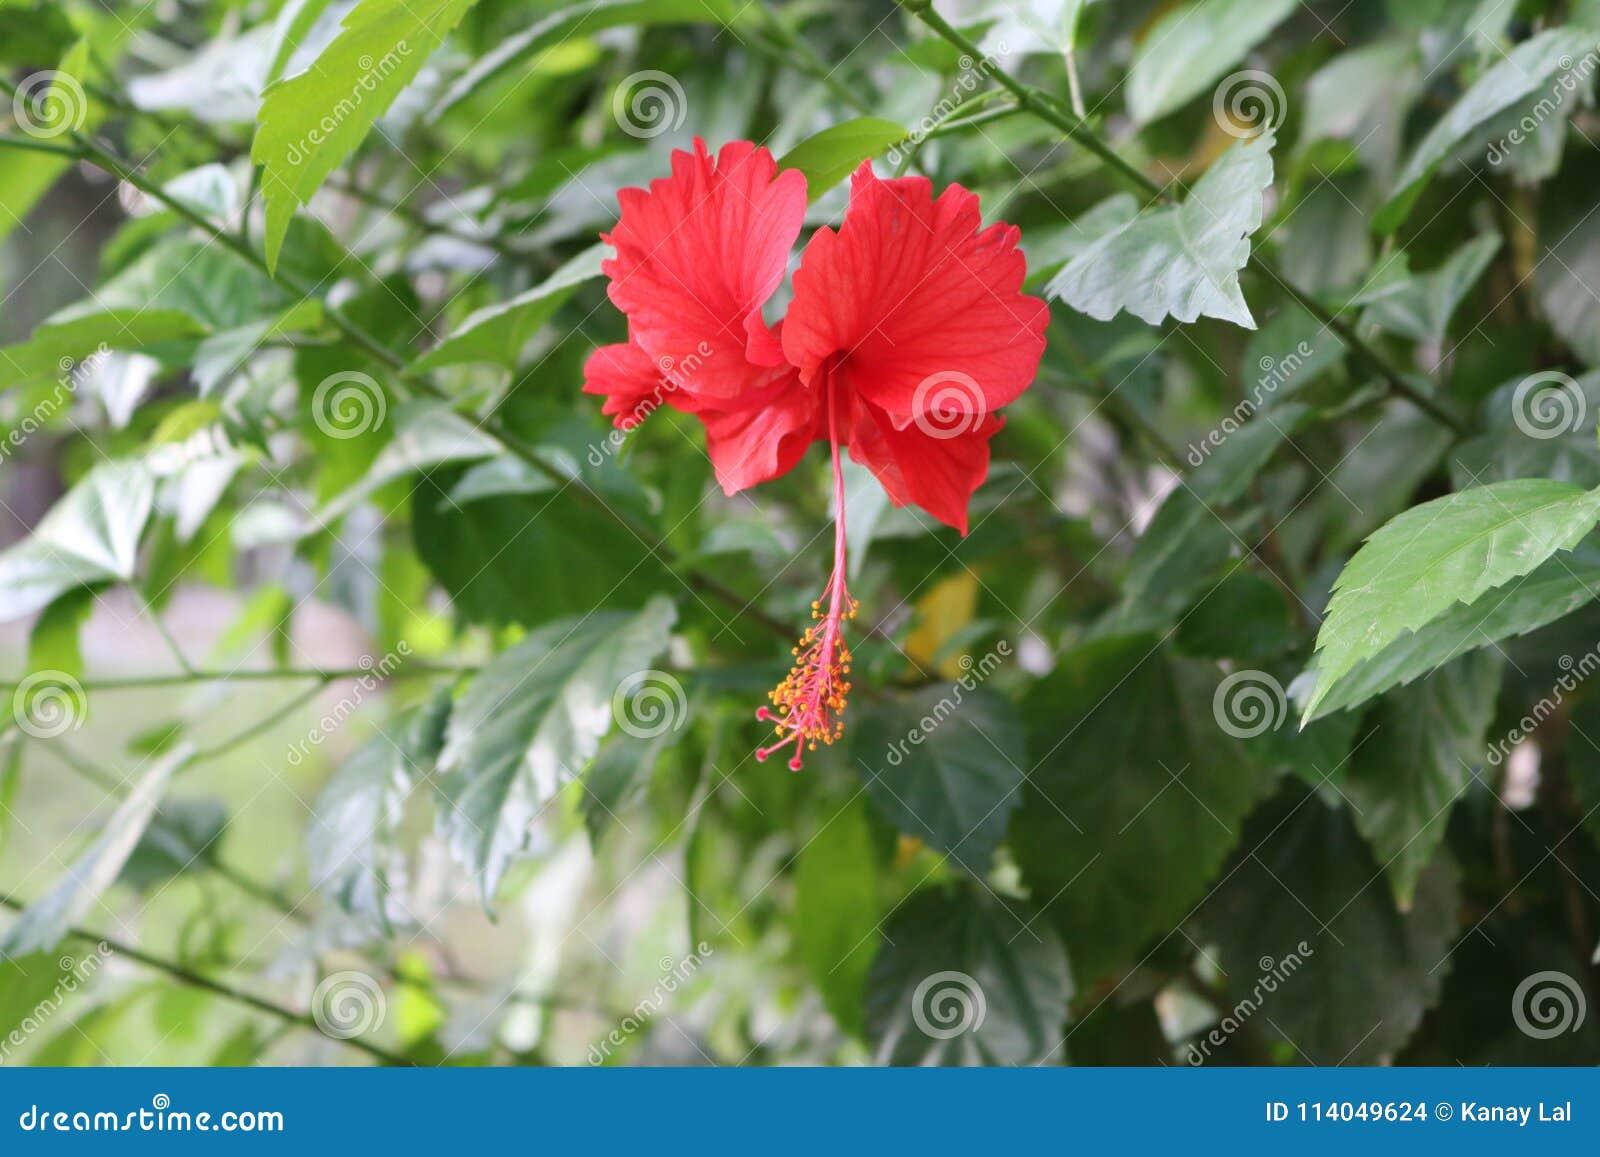 Hibiscus China Rose Flower In Bangladeshi Garden Stock Photo Image